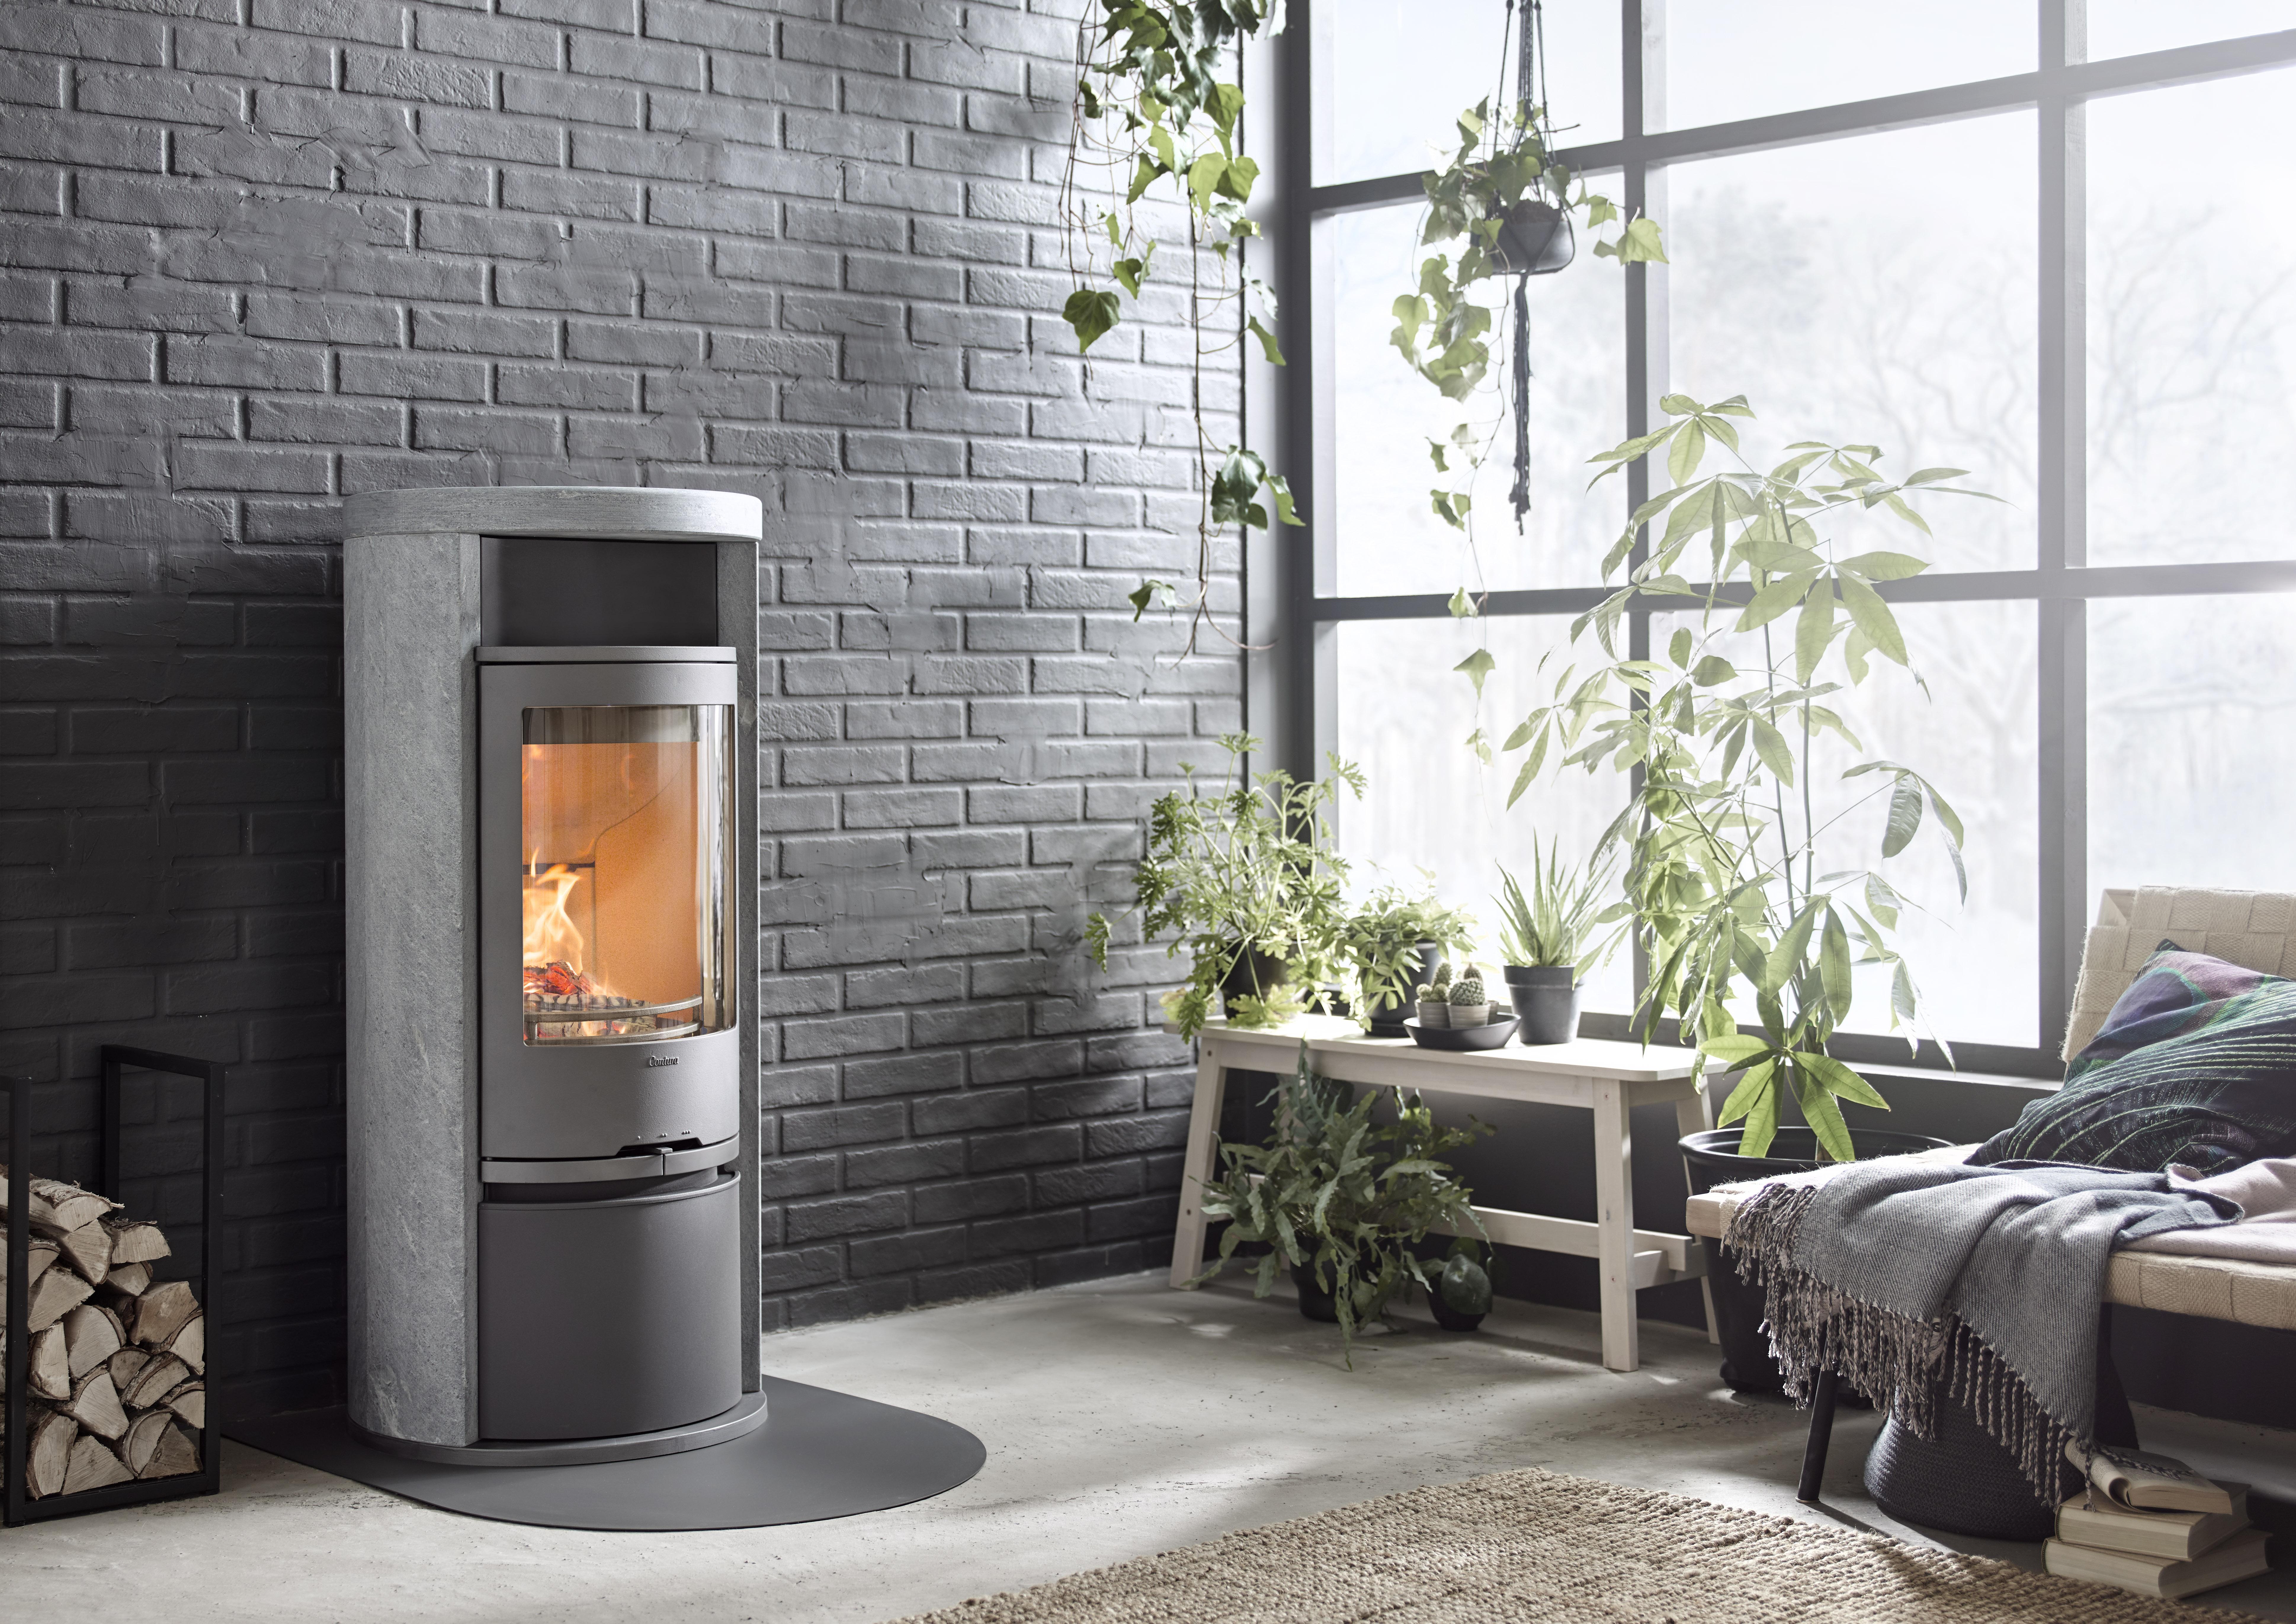 Contura-620t-style-grey